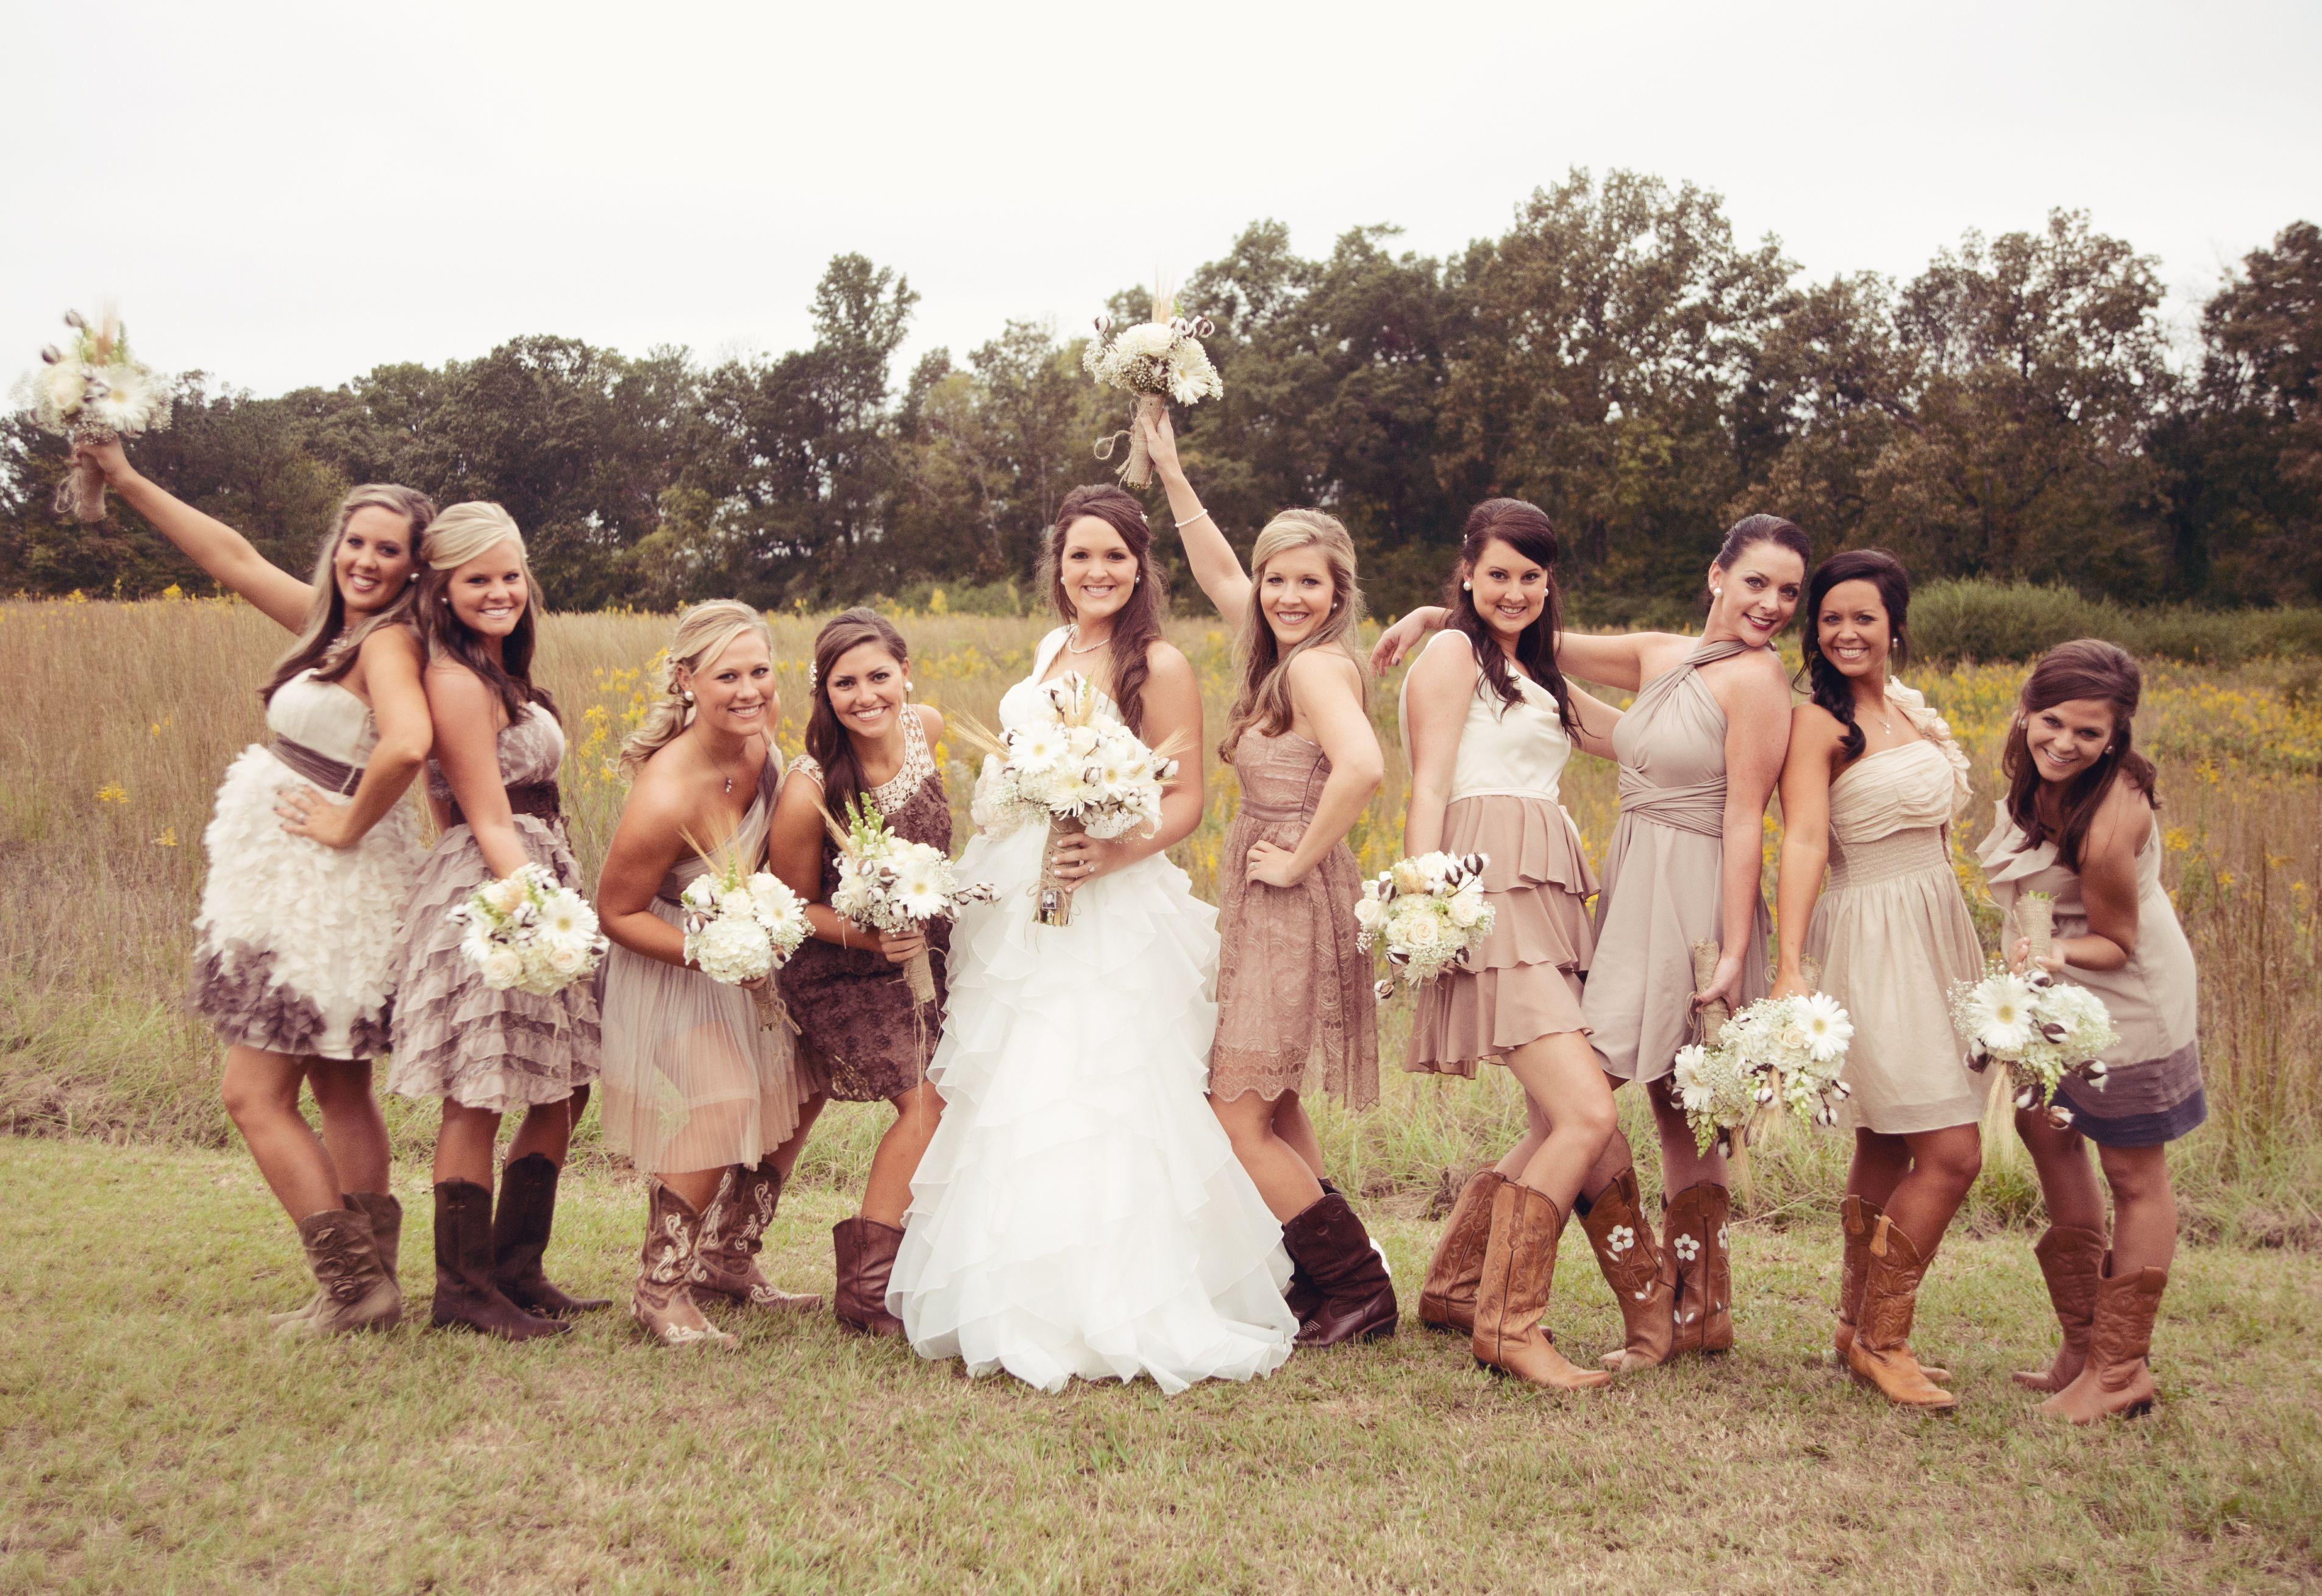 Rustic bridesmaid dresses examples wedding pinterest wedding